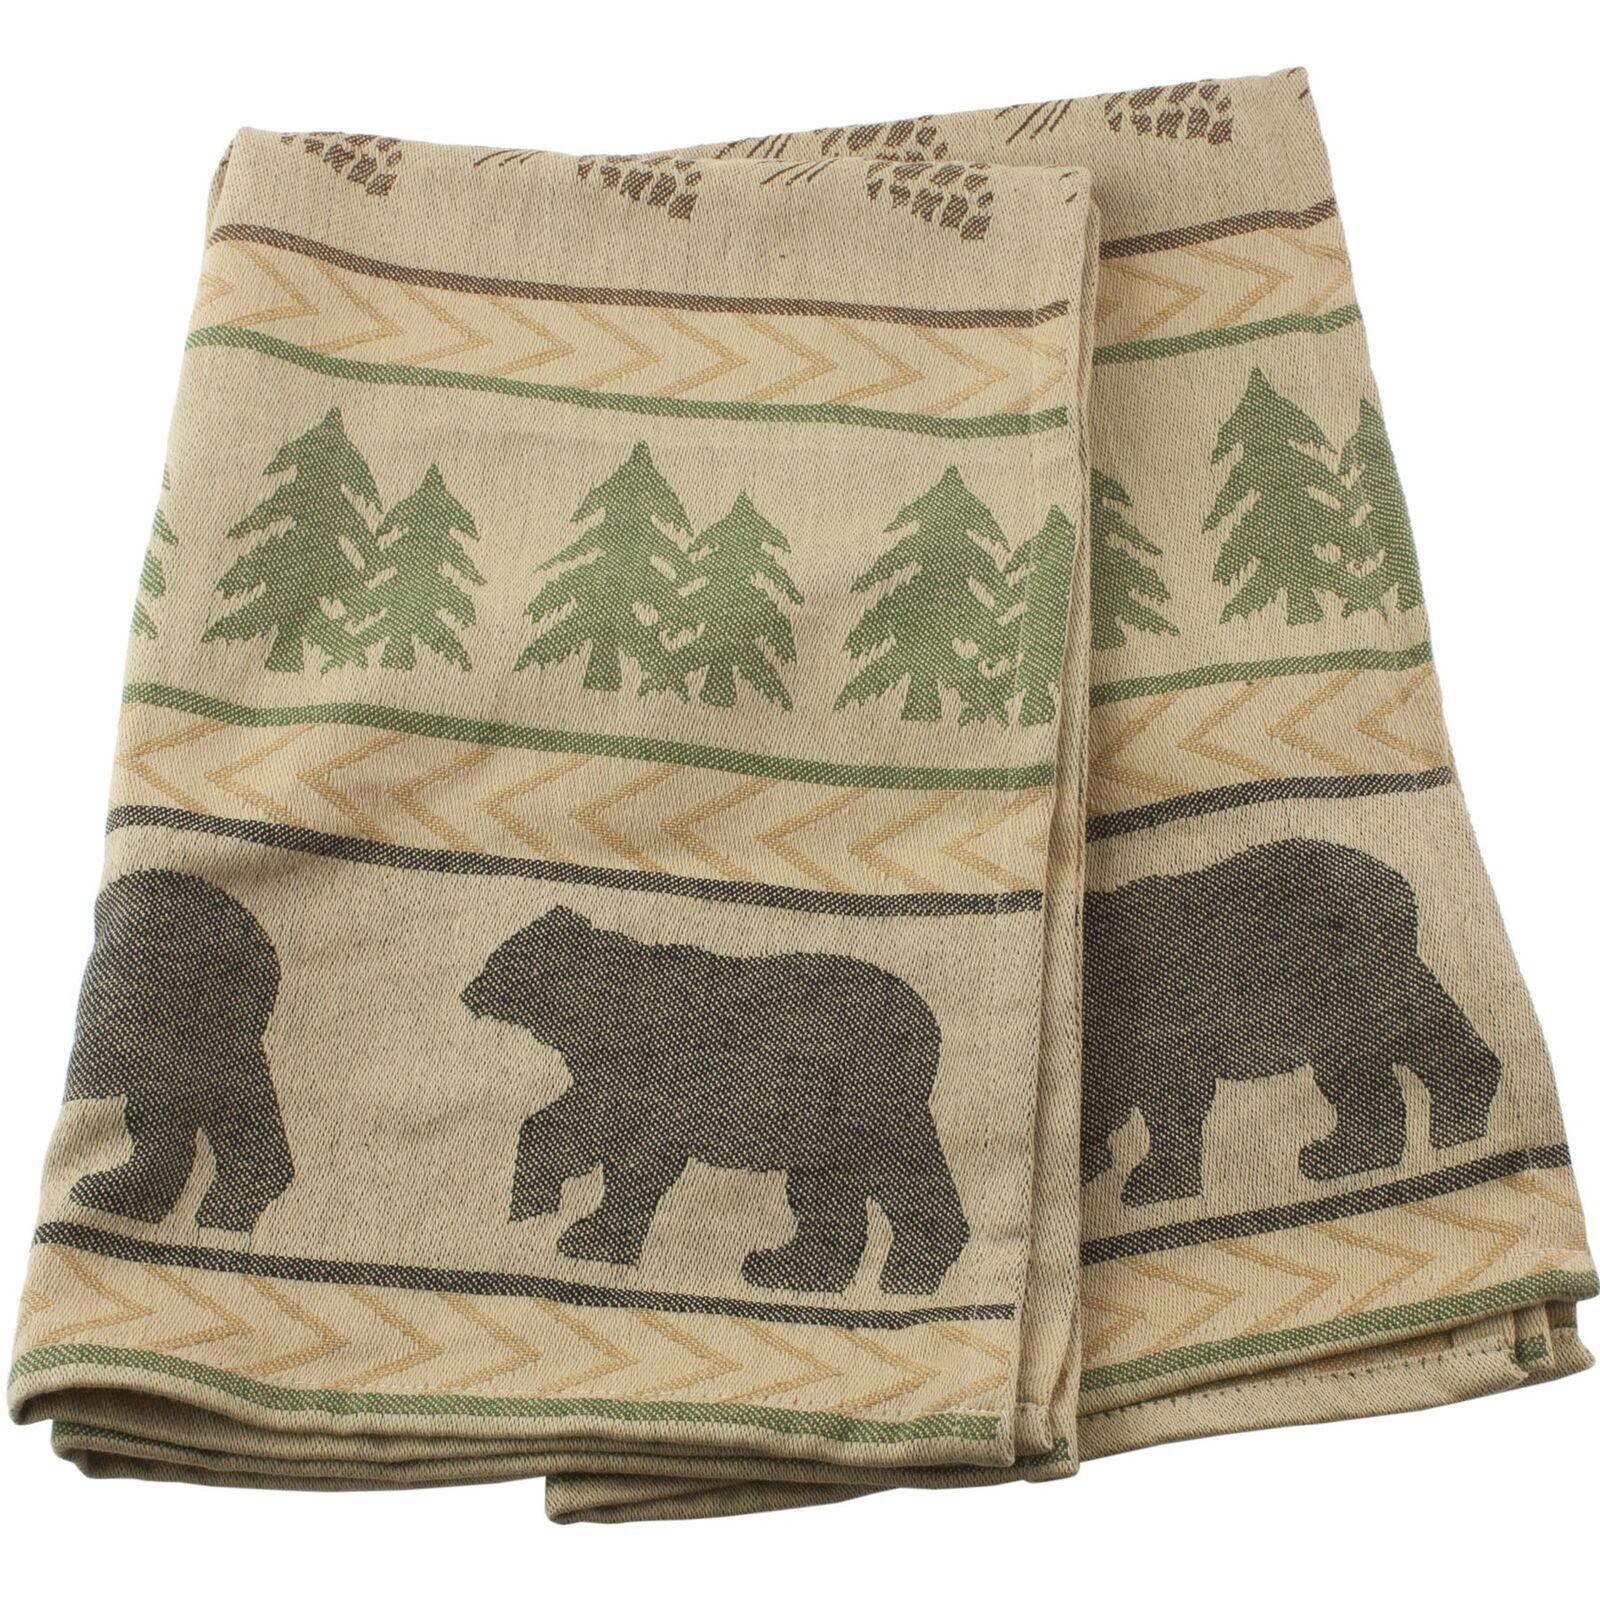 Park Designs Bear Tracks Kitchen Dish Towel Jacquard Pinecone Set of 2